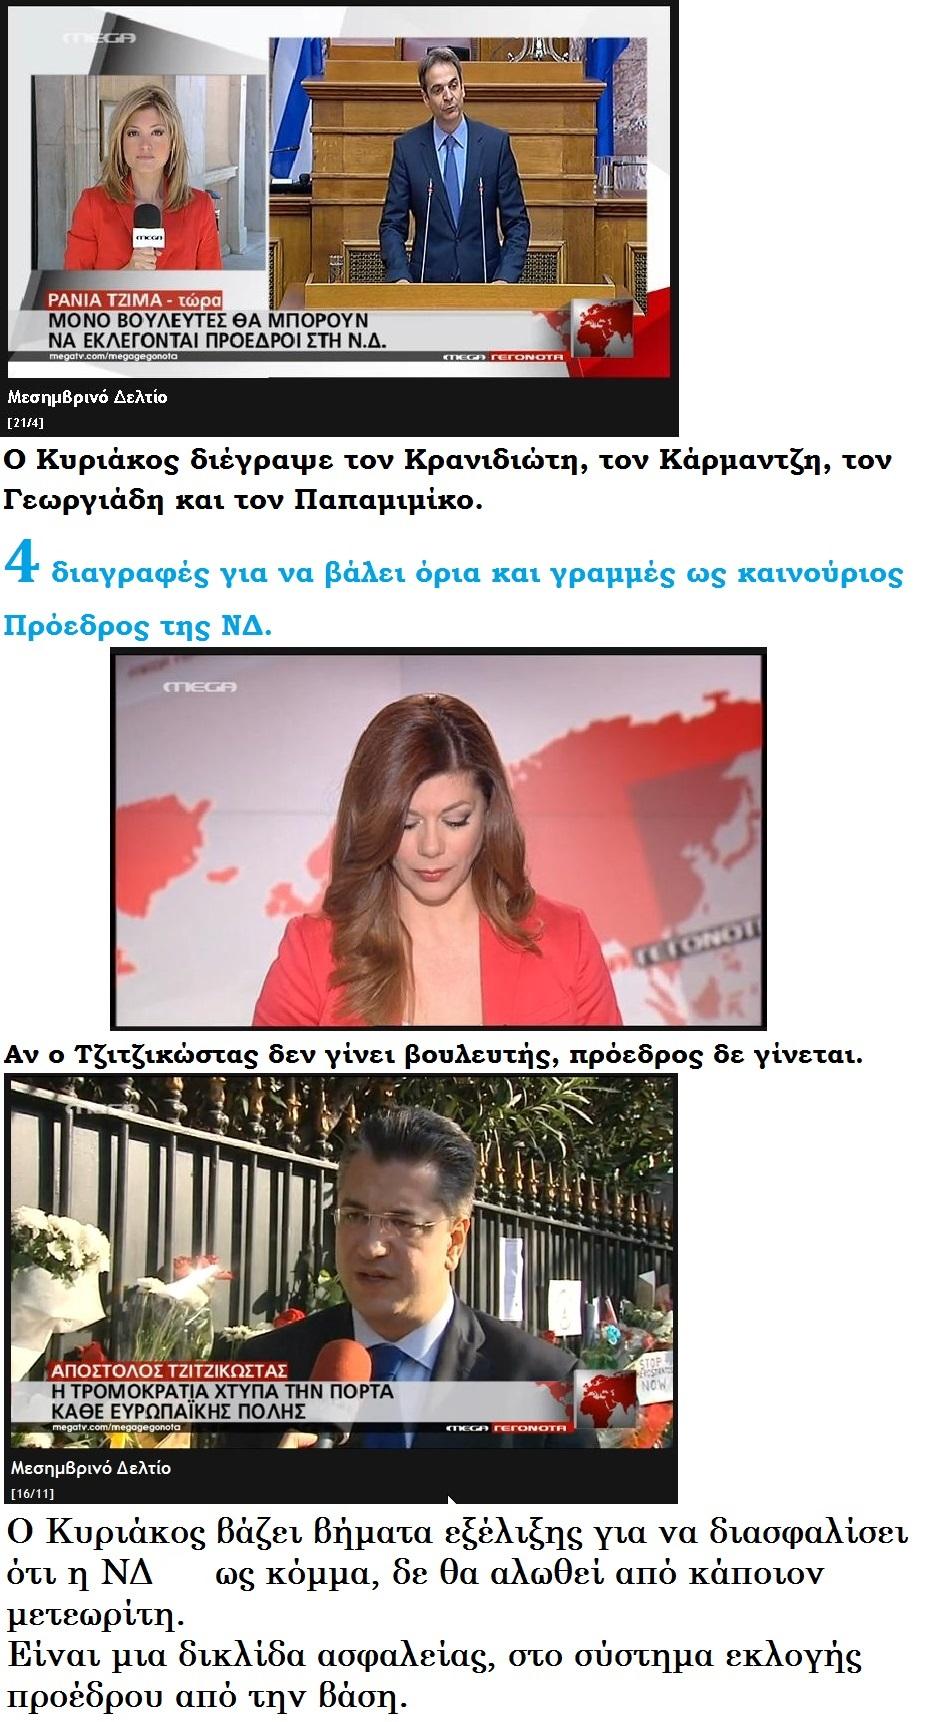 ELLADA ND KYRIAKOS MHTSOTAKHS EKLOGH PROEDROU ELECTIONS 01 290416